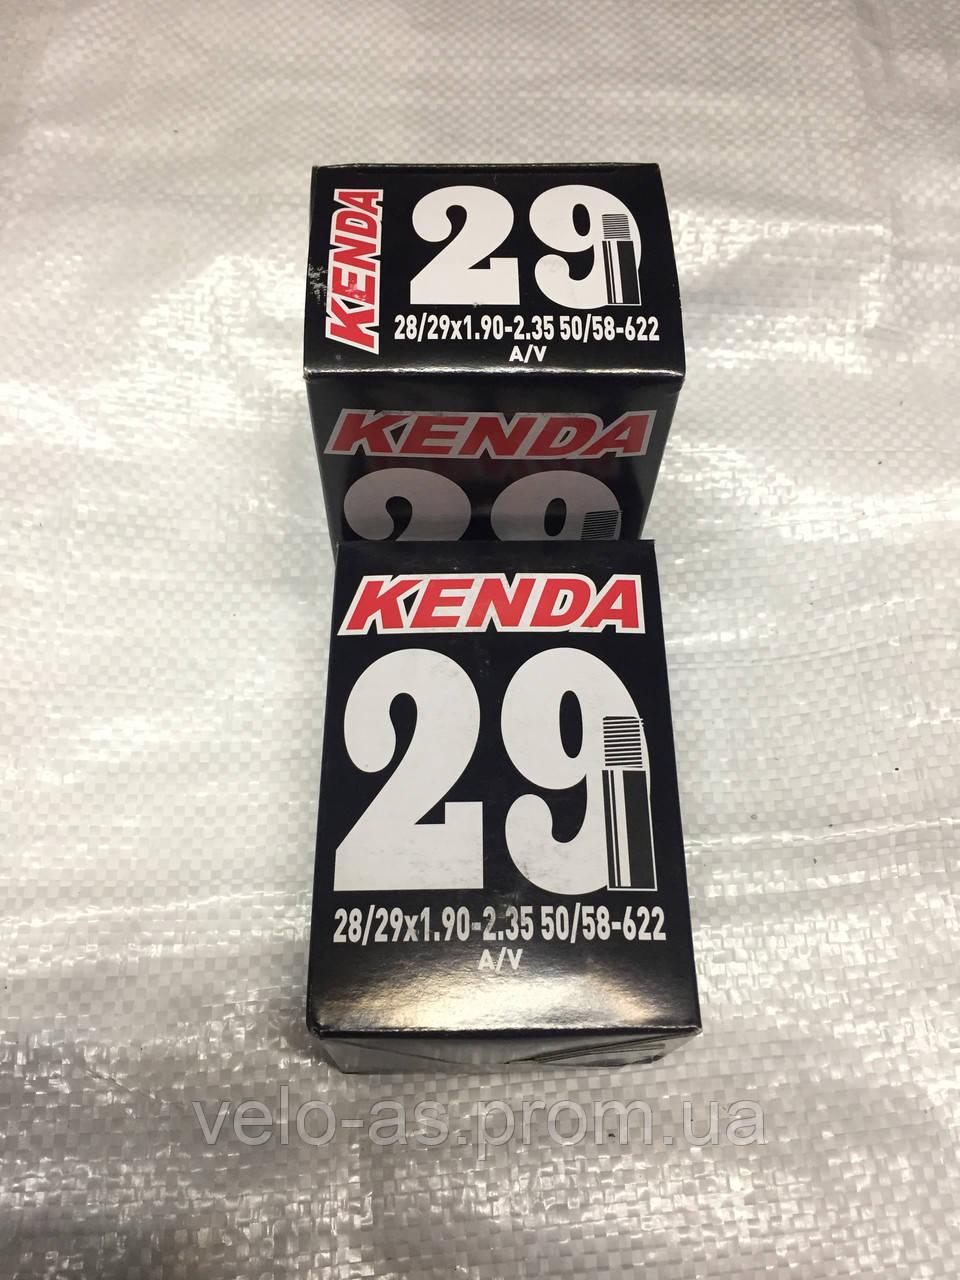 Камера KENDA 28/29x1.90-2.35 50/58-622 A/V